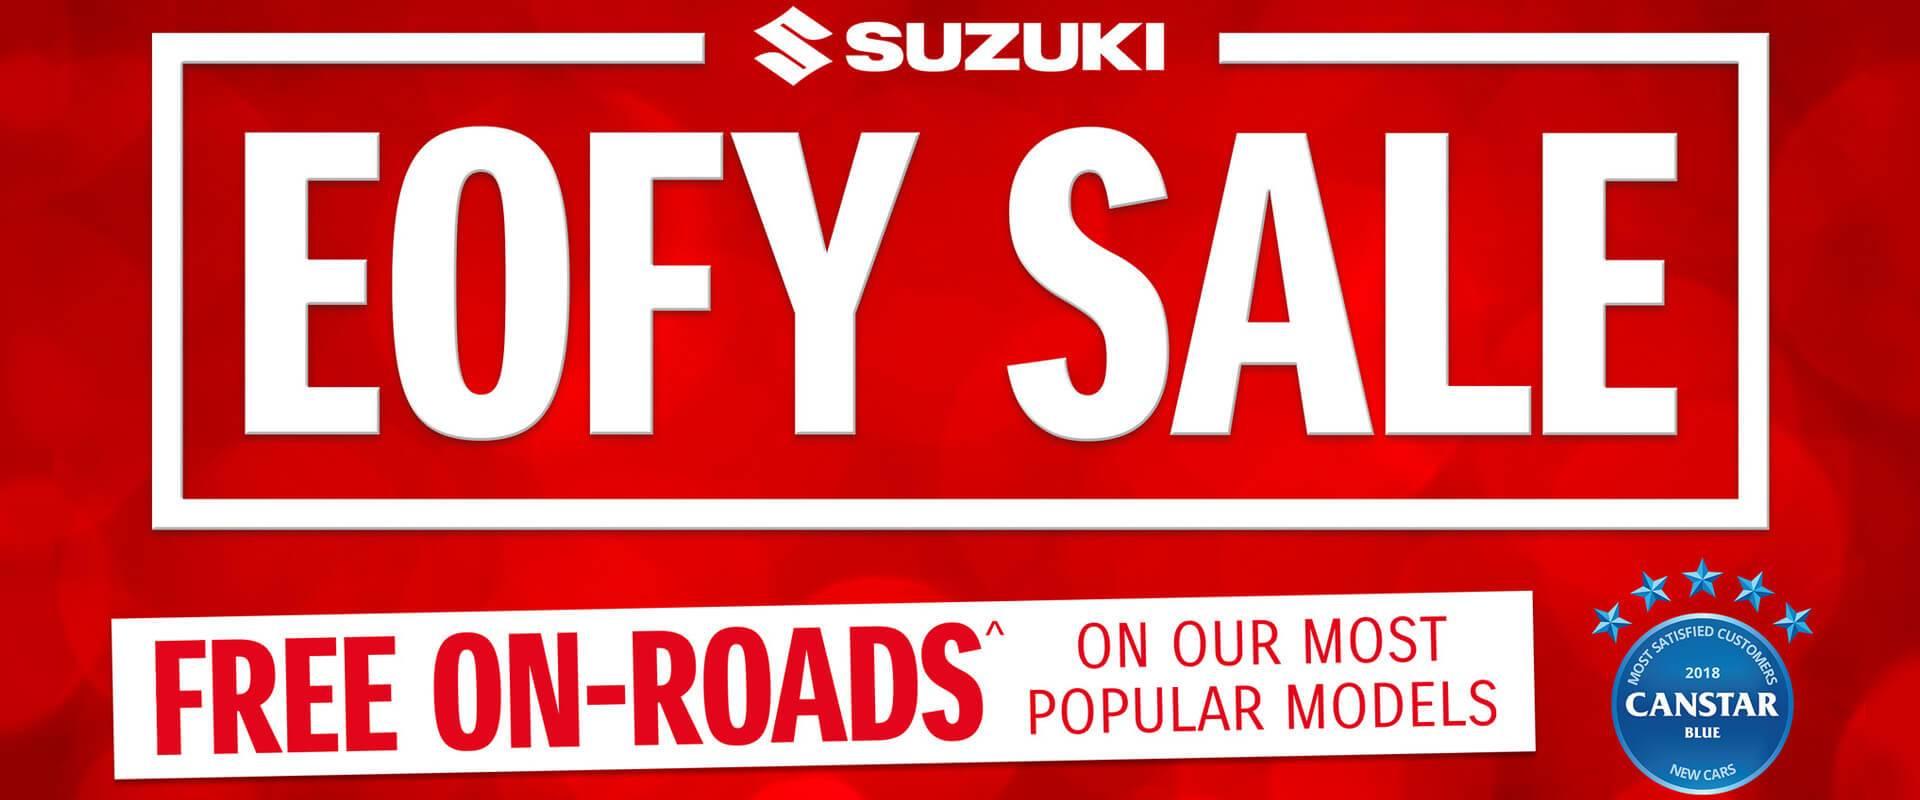 Suzuki EOFY Sale